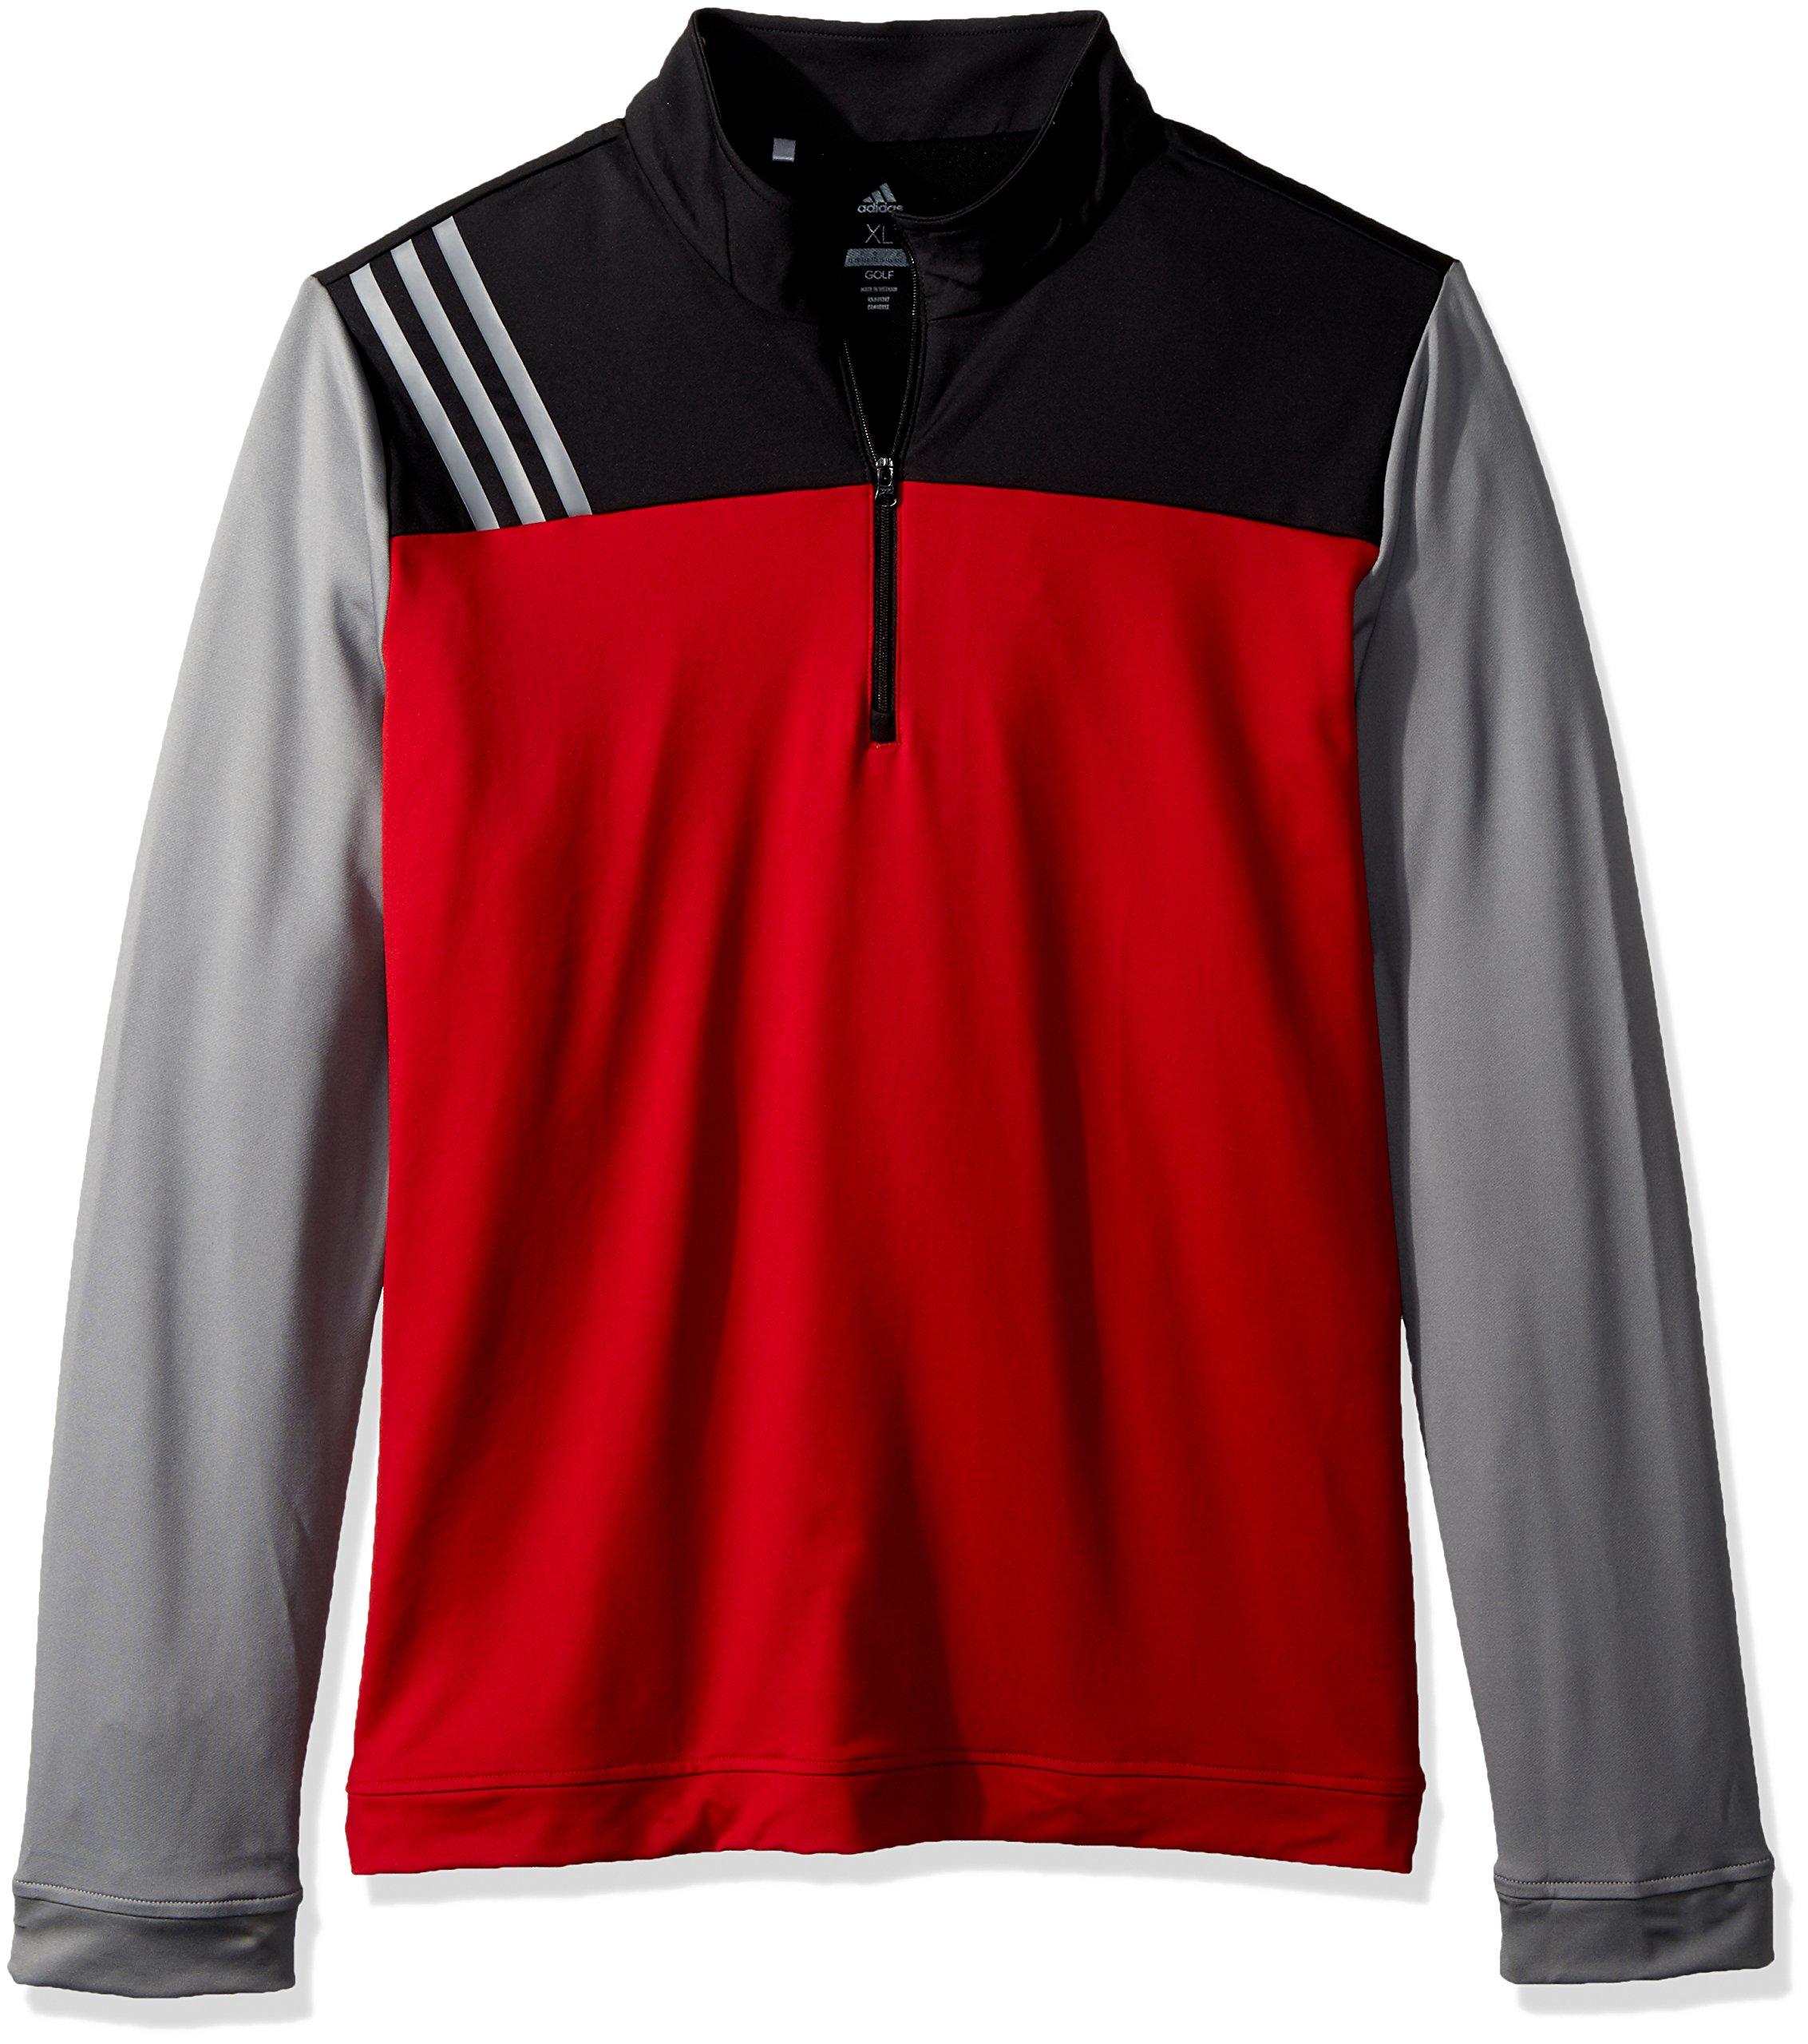 adidas Golf 3-Stripe Layering Jacket, Power Red, Small